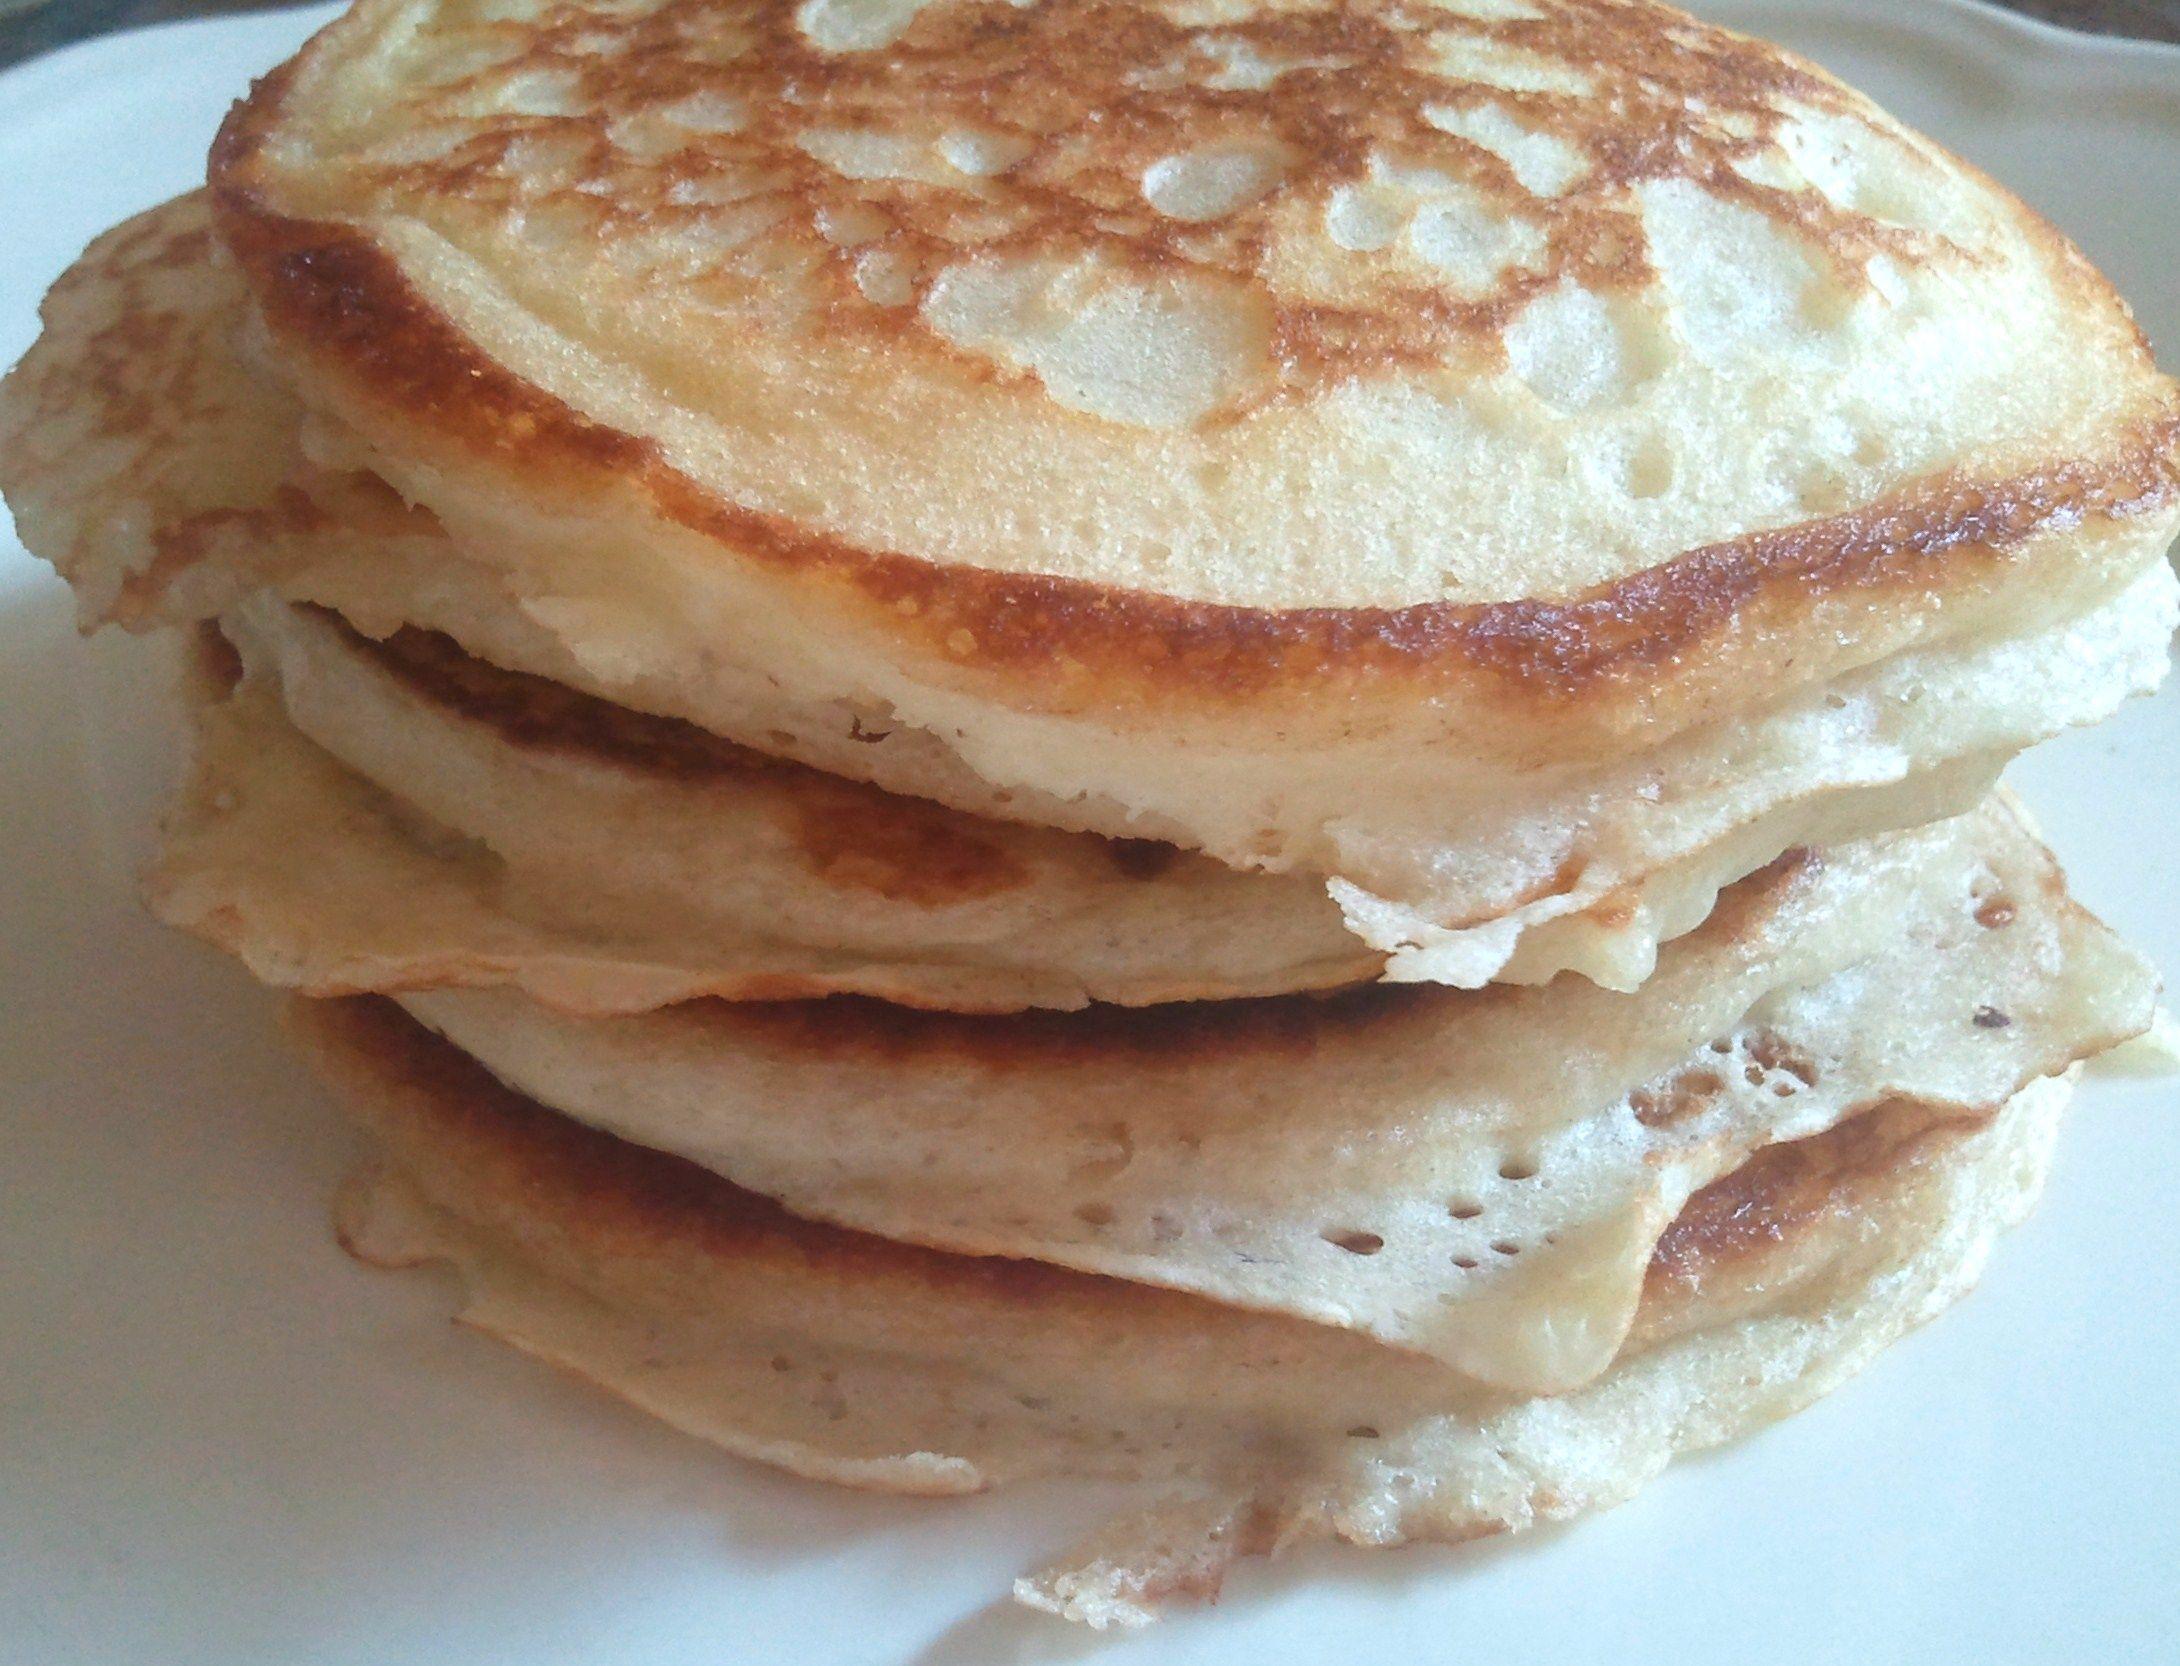 Best pancake recipe ever recipes and good food for Award winning pancake recipe